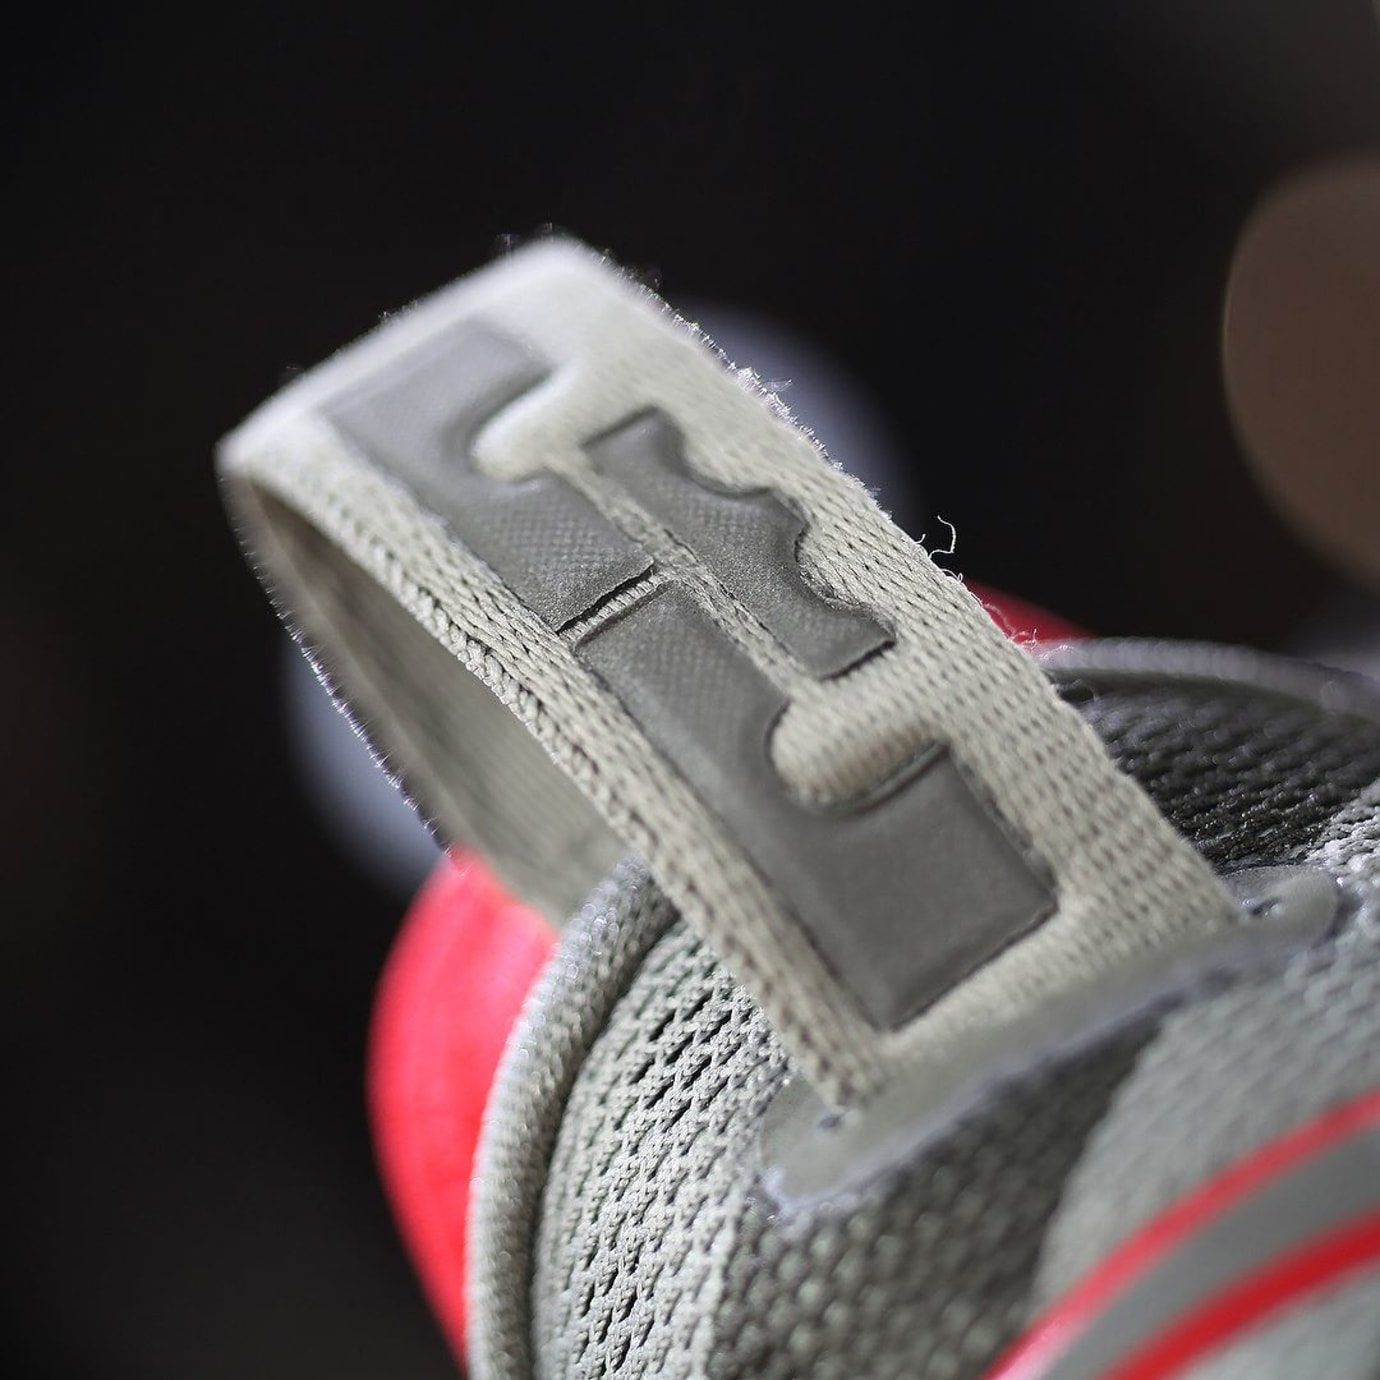 b30c4e7c1188f Nike LeBron 14 Low Olive Release Date 878635-003 (12)